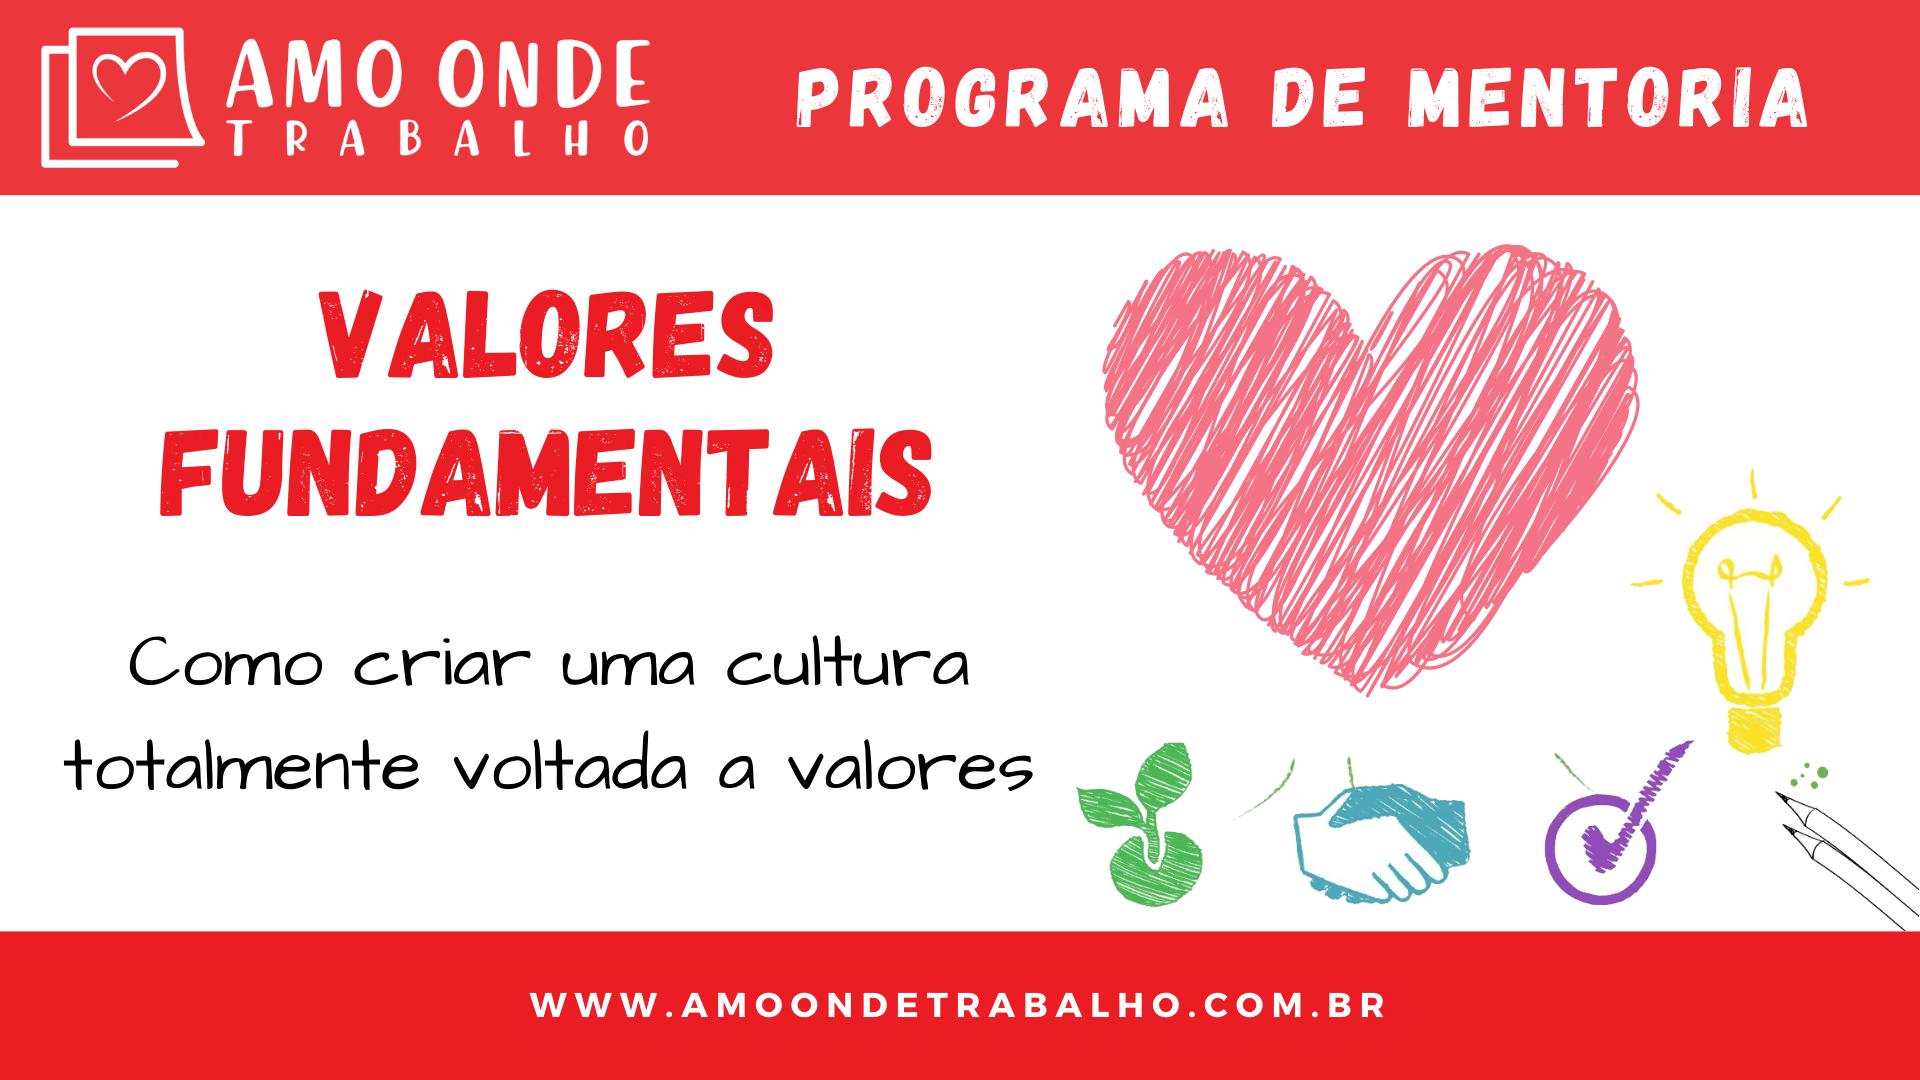 Programa de Mentoria - Valores Fundamentais